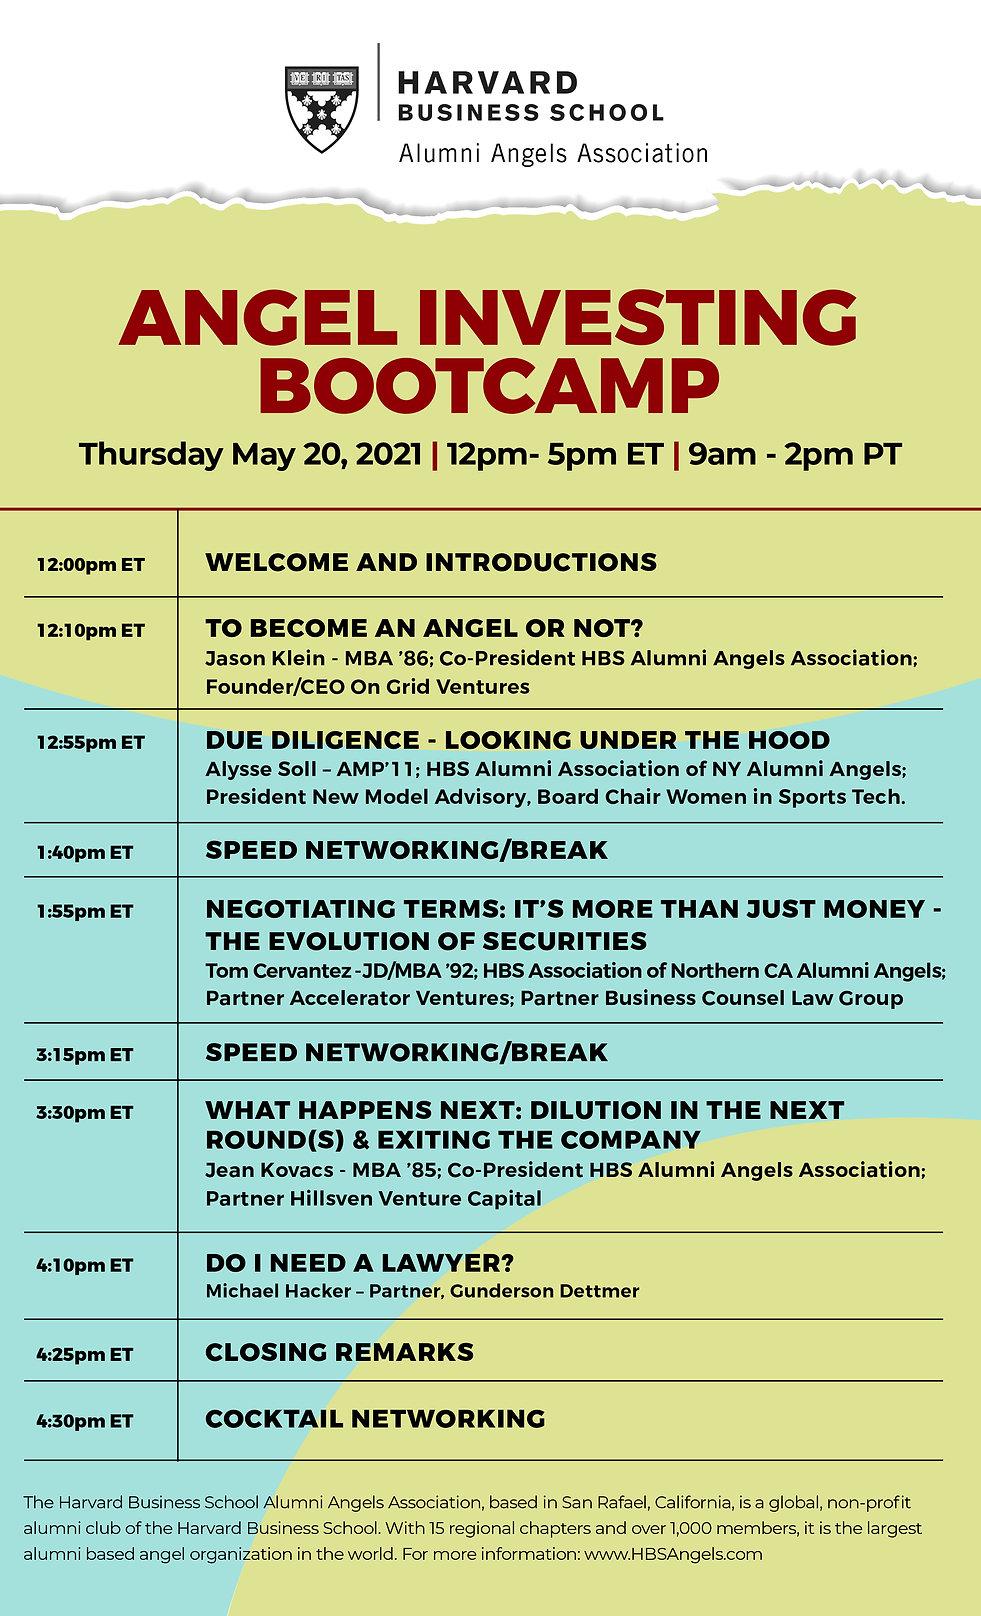 20210520 Bootcamp Agenda FINAL.jpg